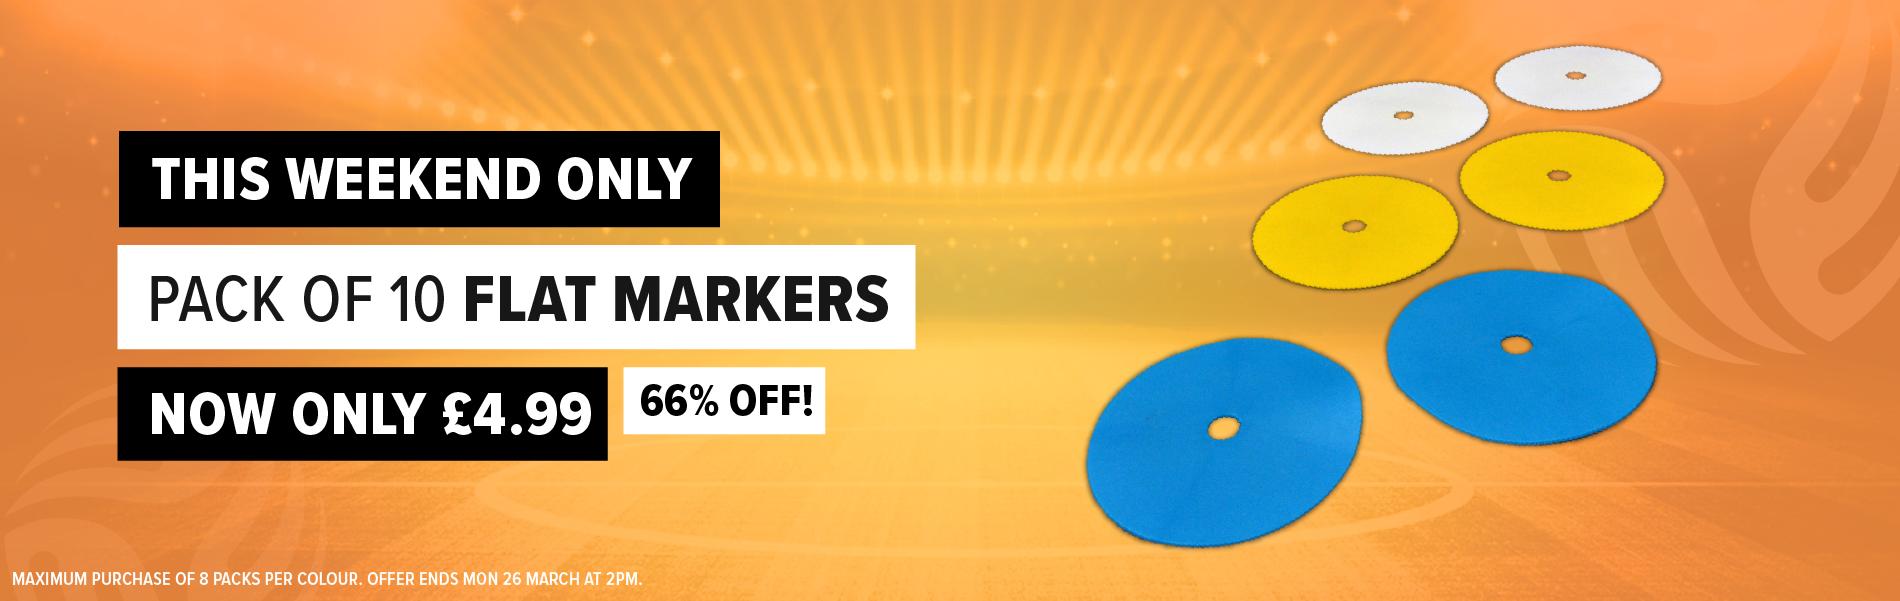 Weekend Deal - Flat Markers